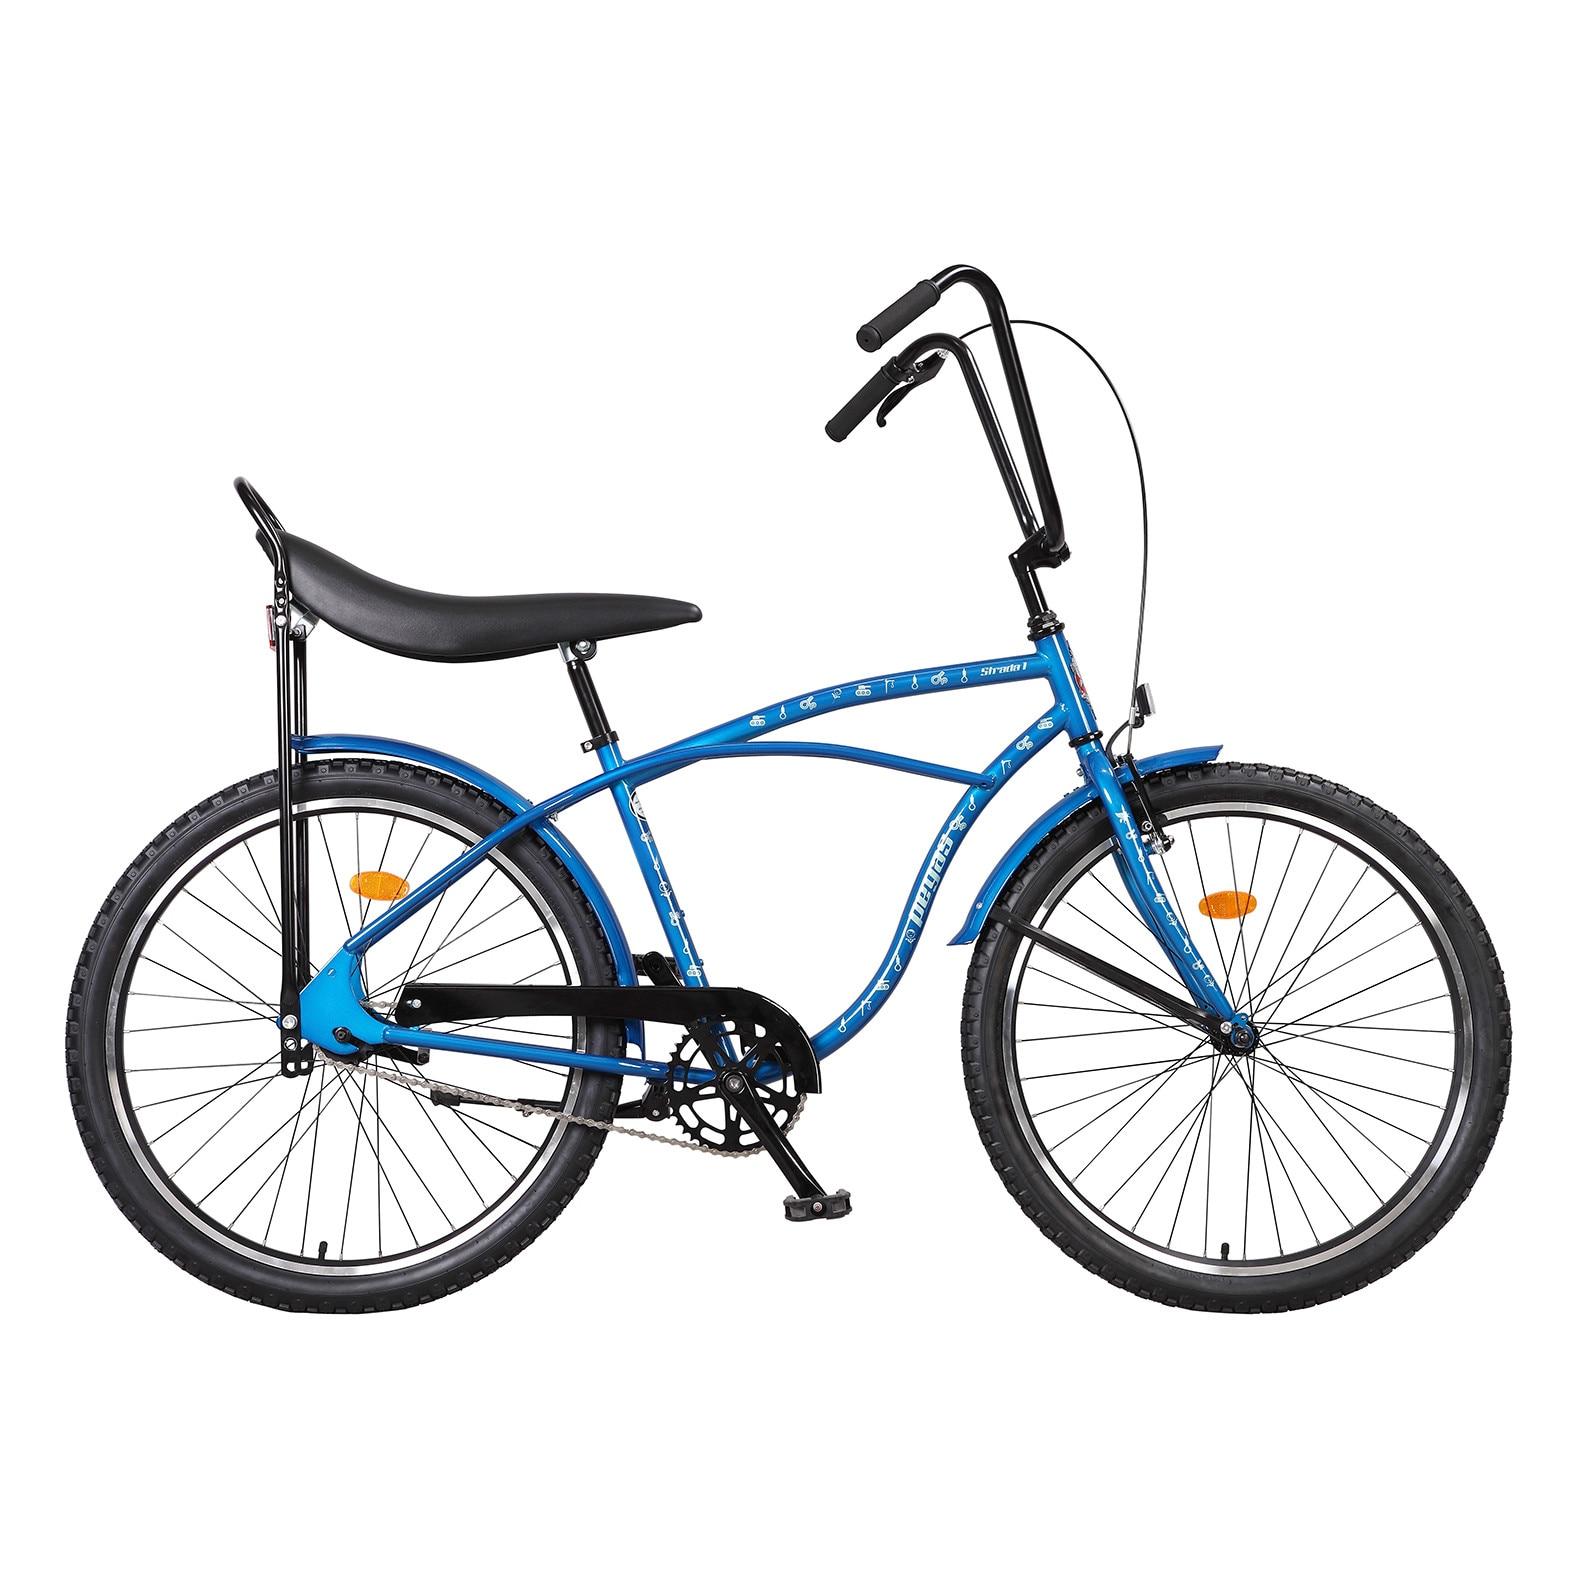 Fotografie Bicicleta Pegas Strada 1 Otel 2s, Albastru Franghii